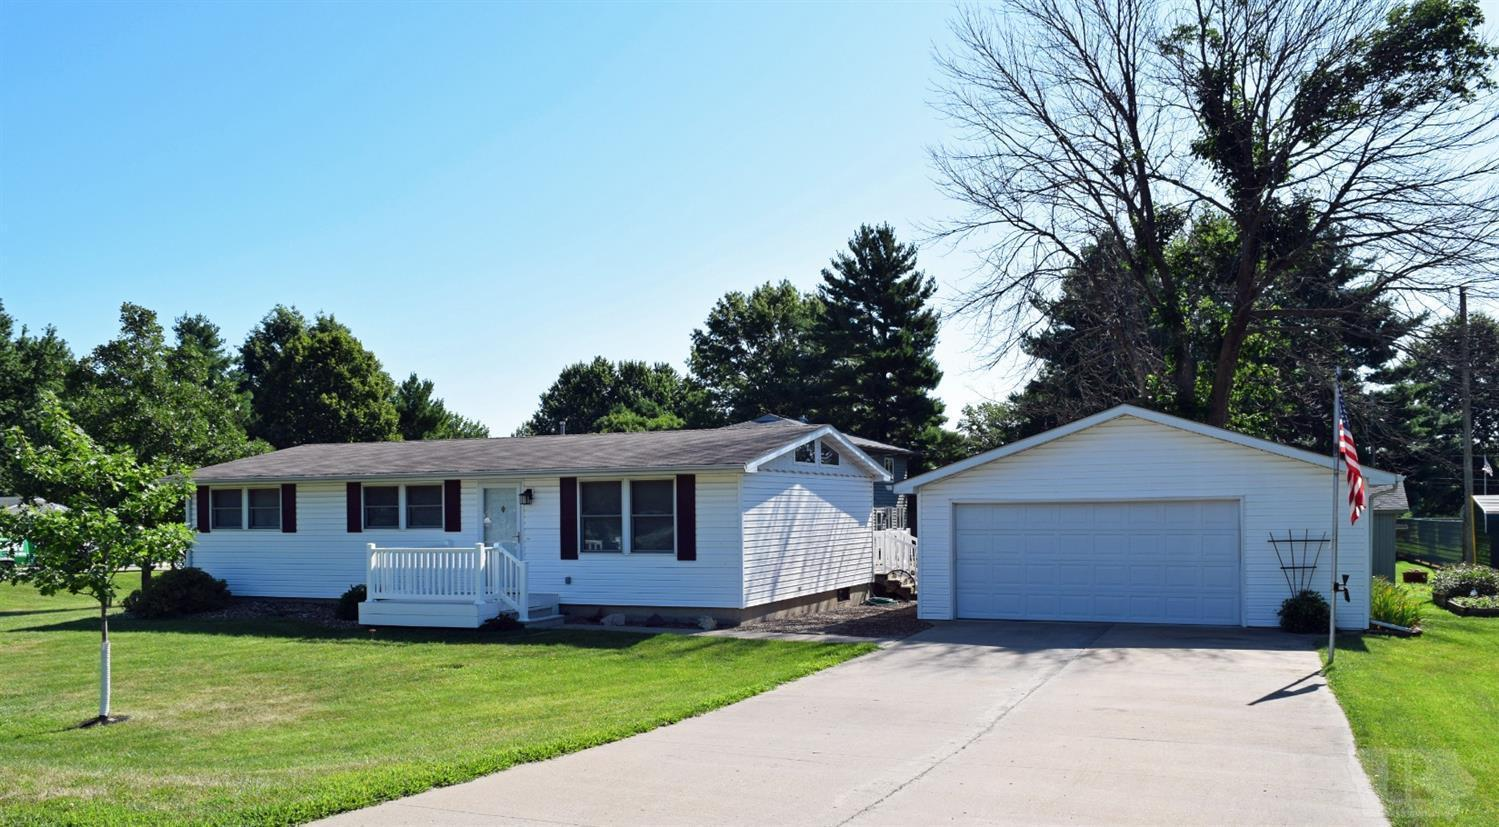 801 33rd Property Photo - Fairfield, IA real estate listing